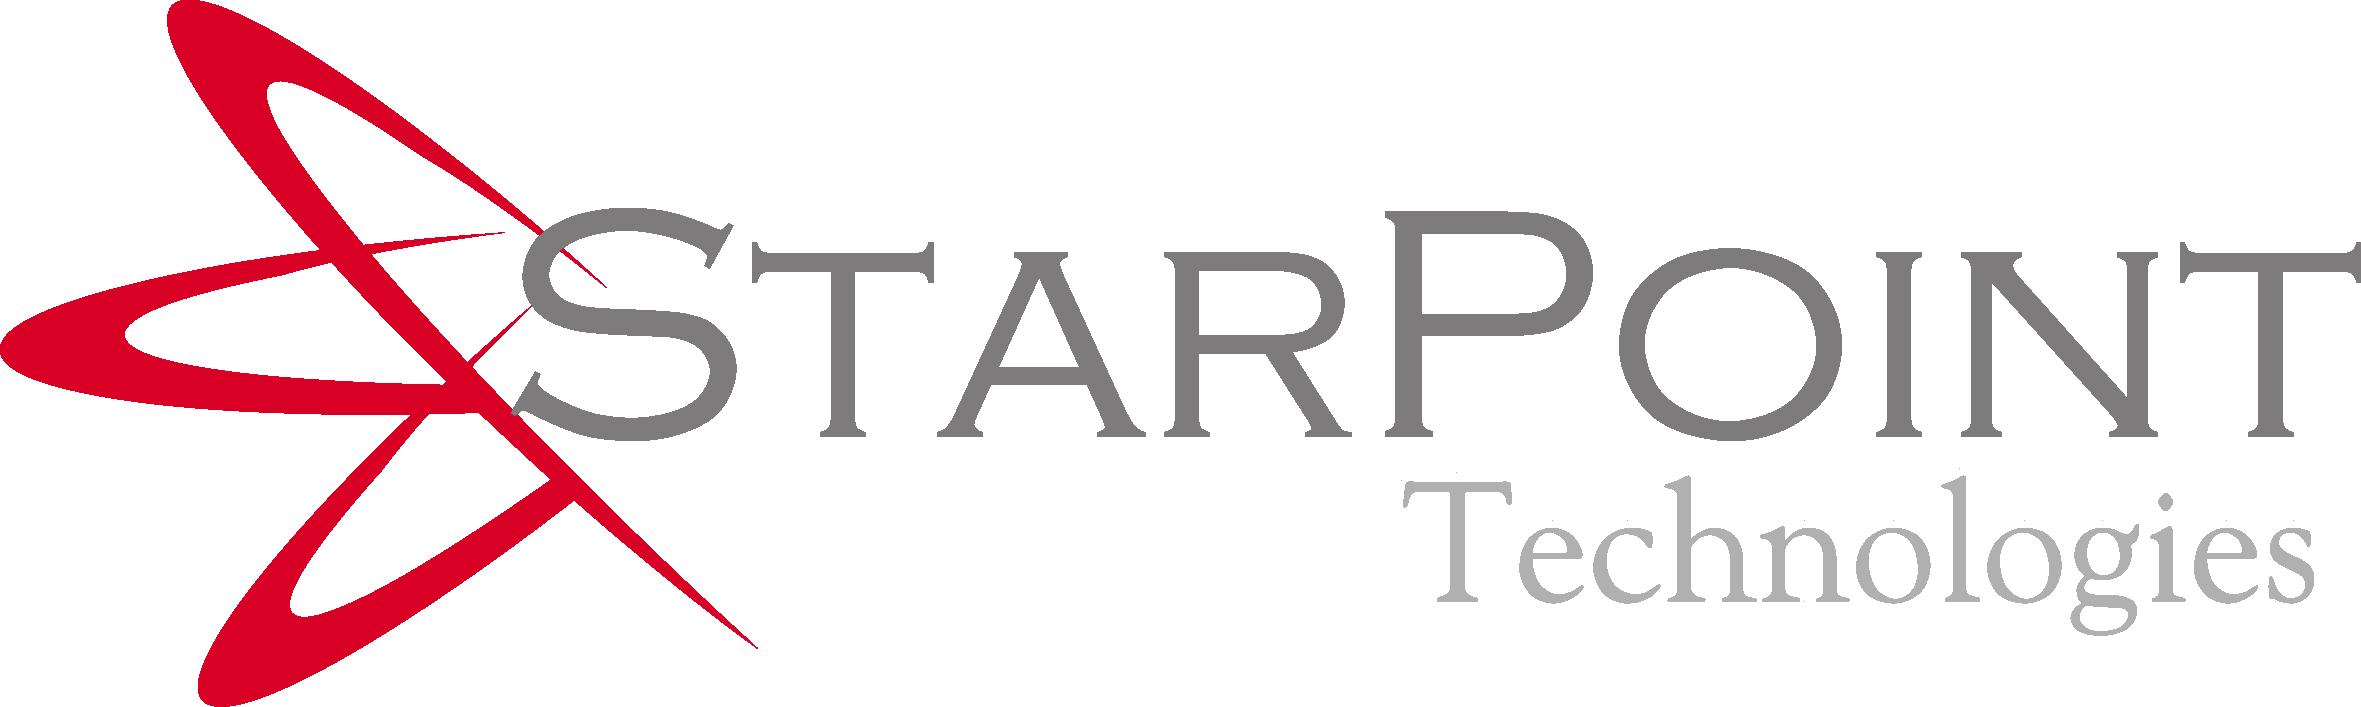 starpoint logo - transparent